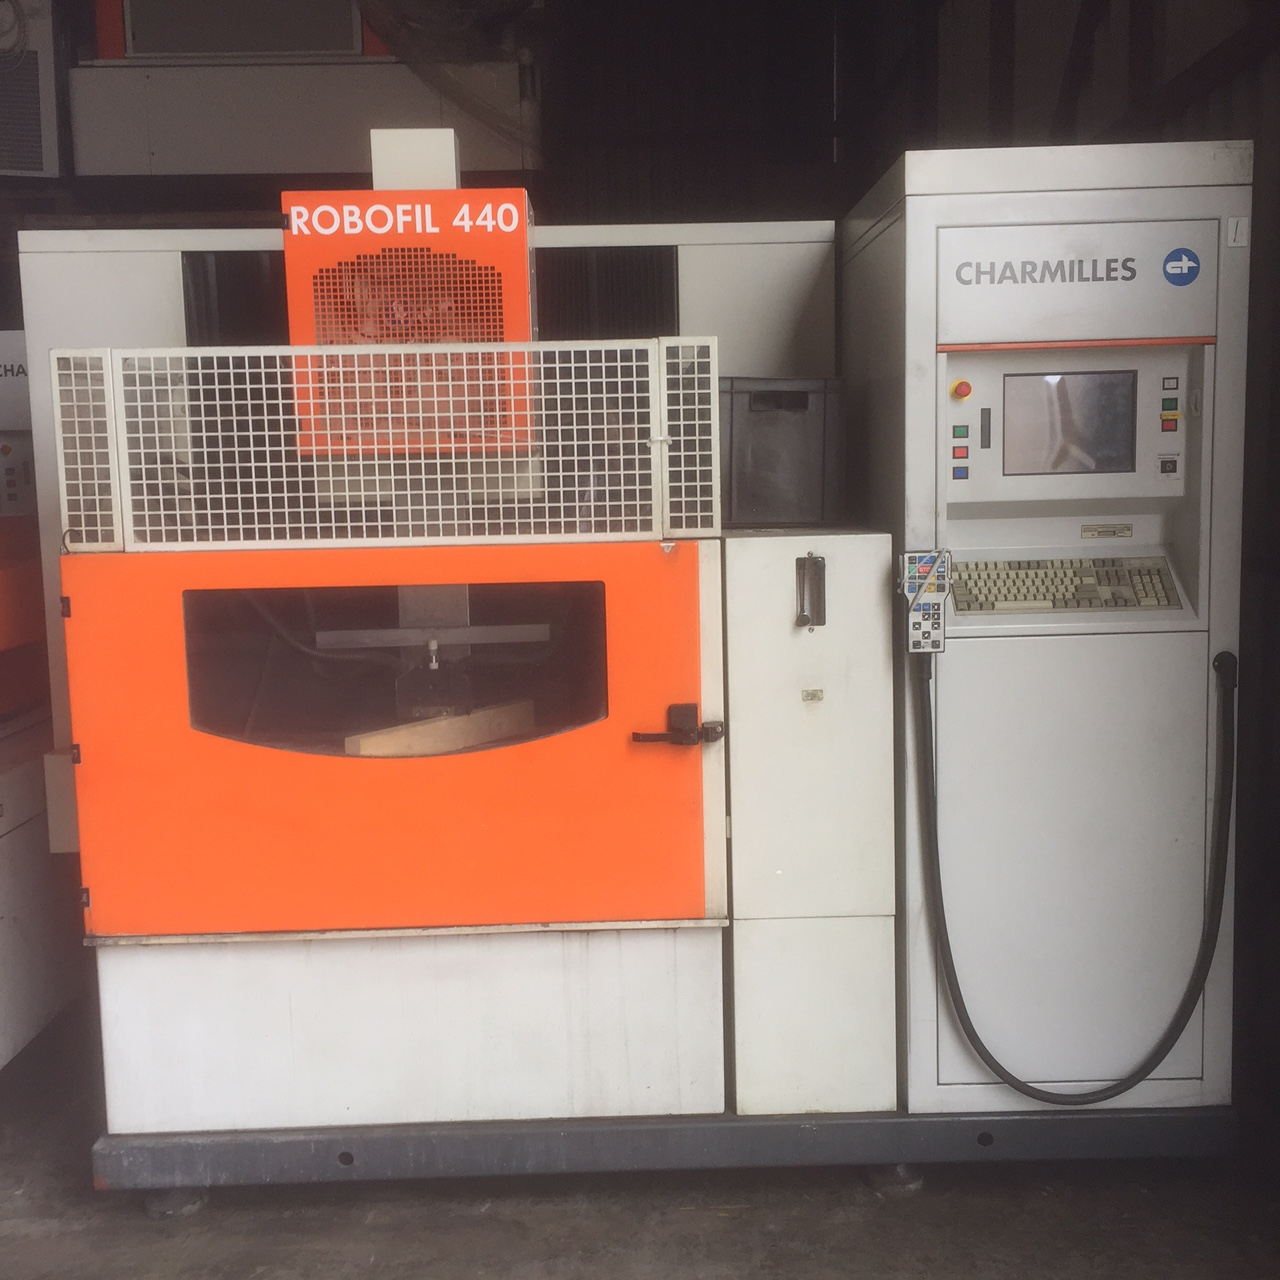 Charmilles Robofil 440 - 2001 Wire cutting edm machine (SOLD/VENDU/VERKAUFT)